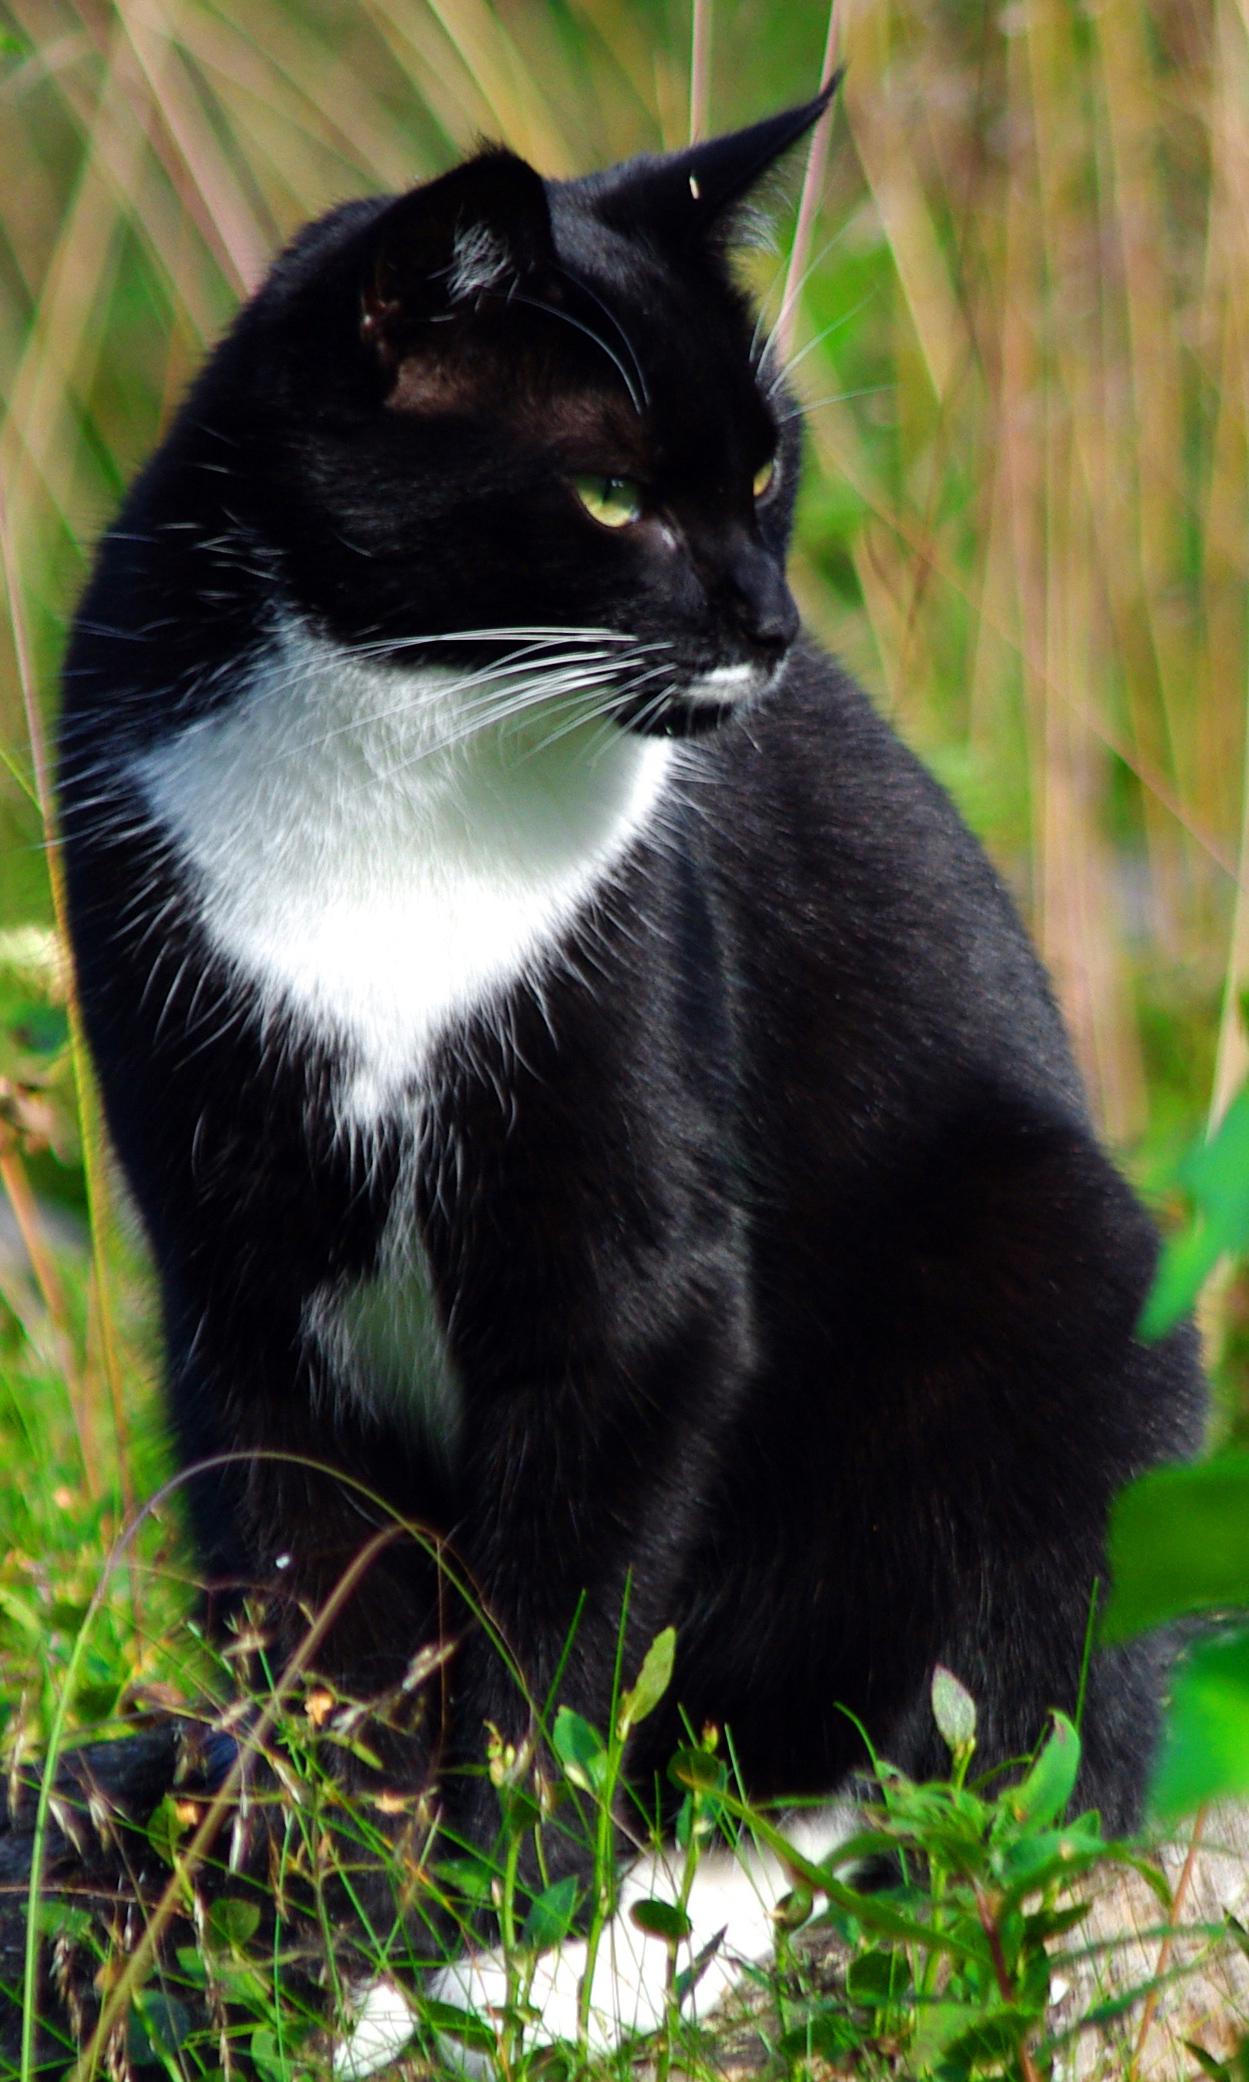 Normwerte Katze